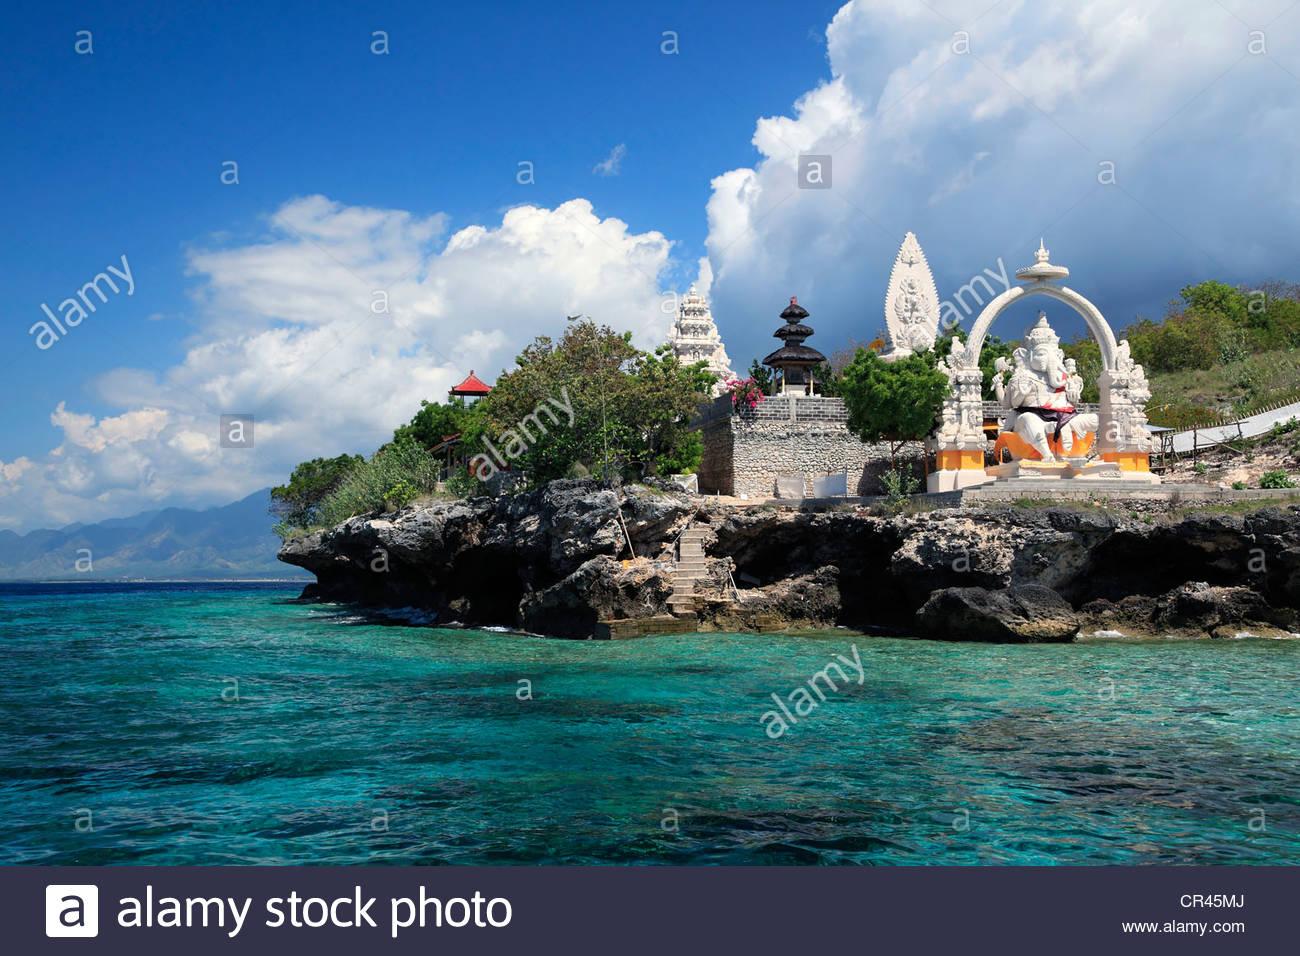 Temple by the sea, Menjangan, Bali, Indonesia, Southeast Asia, Asia - Stock Image